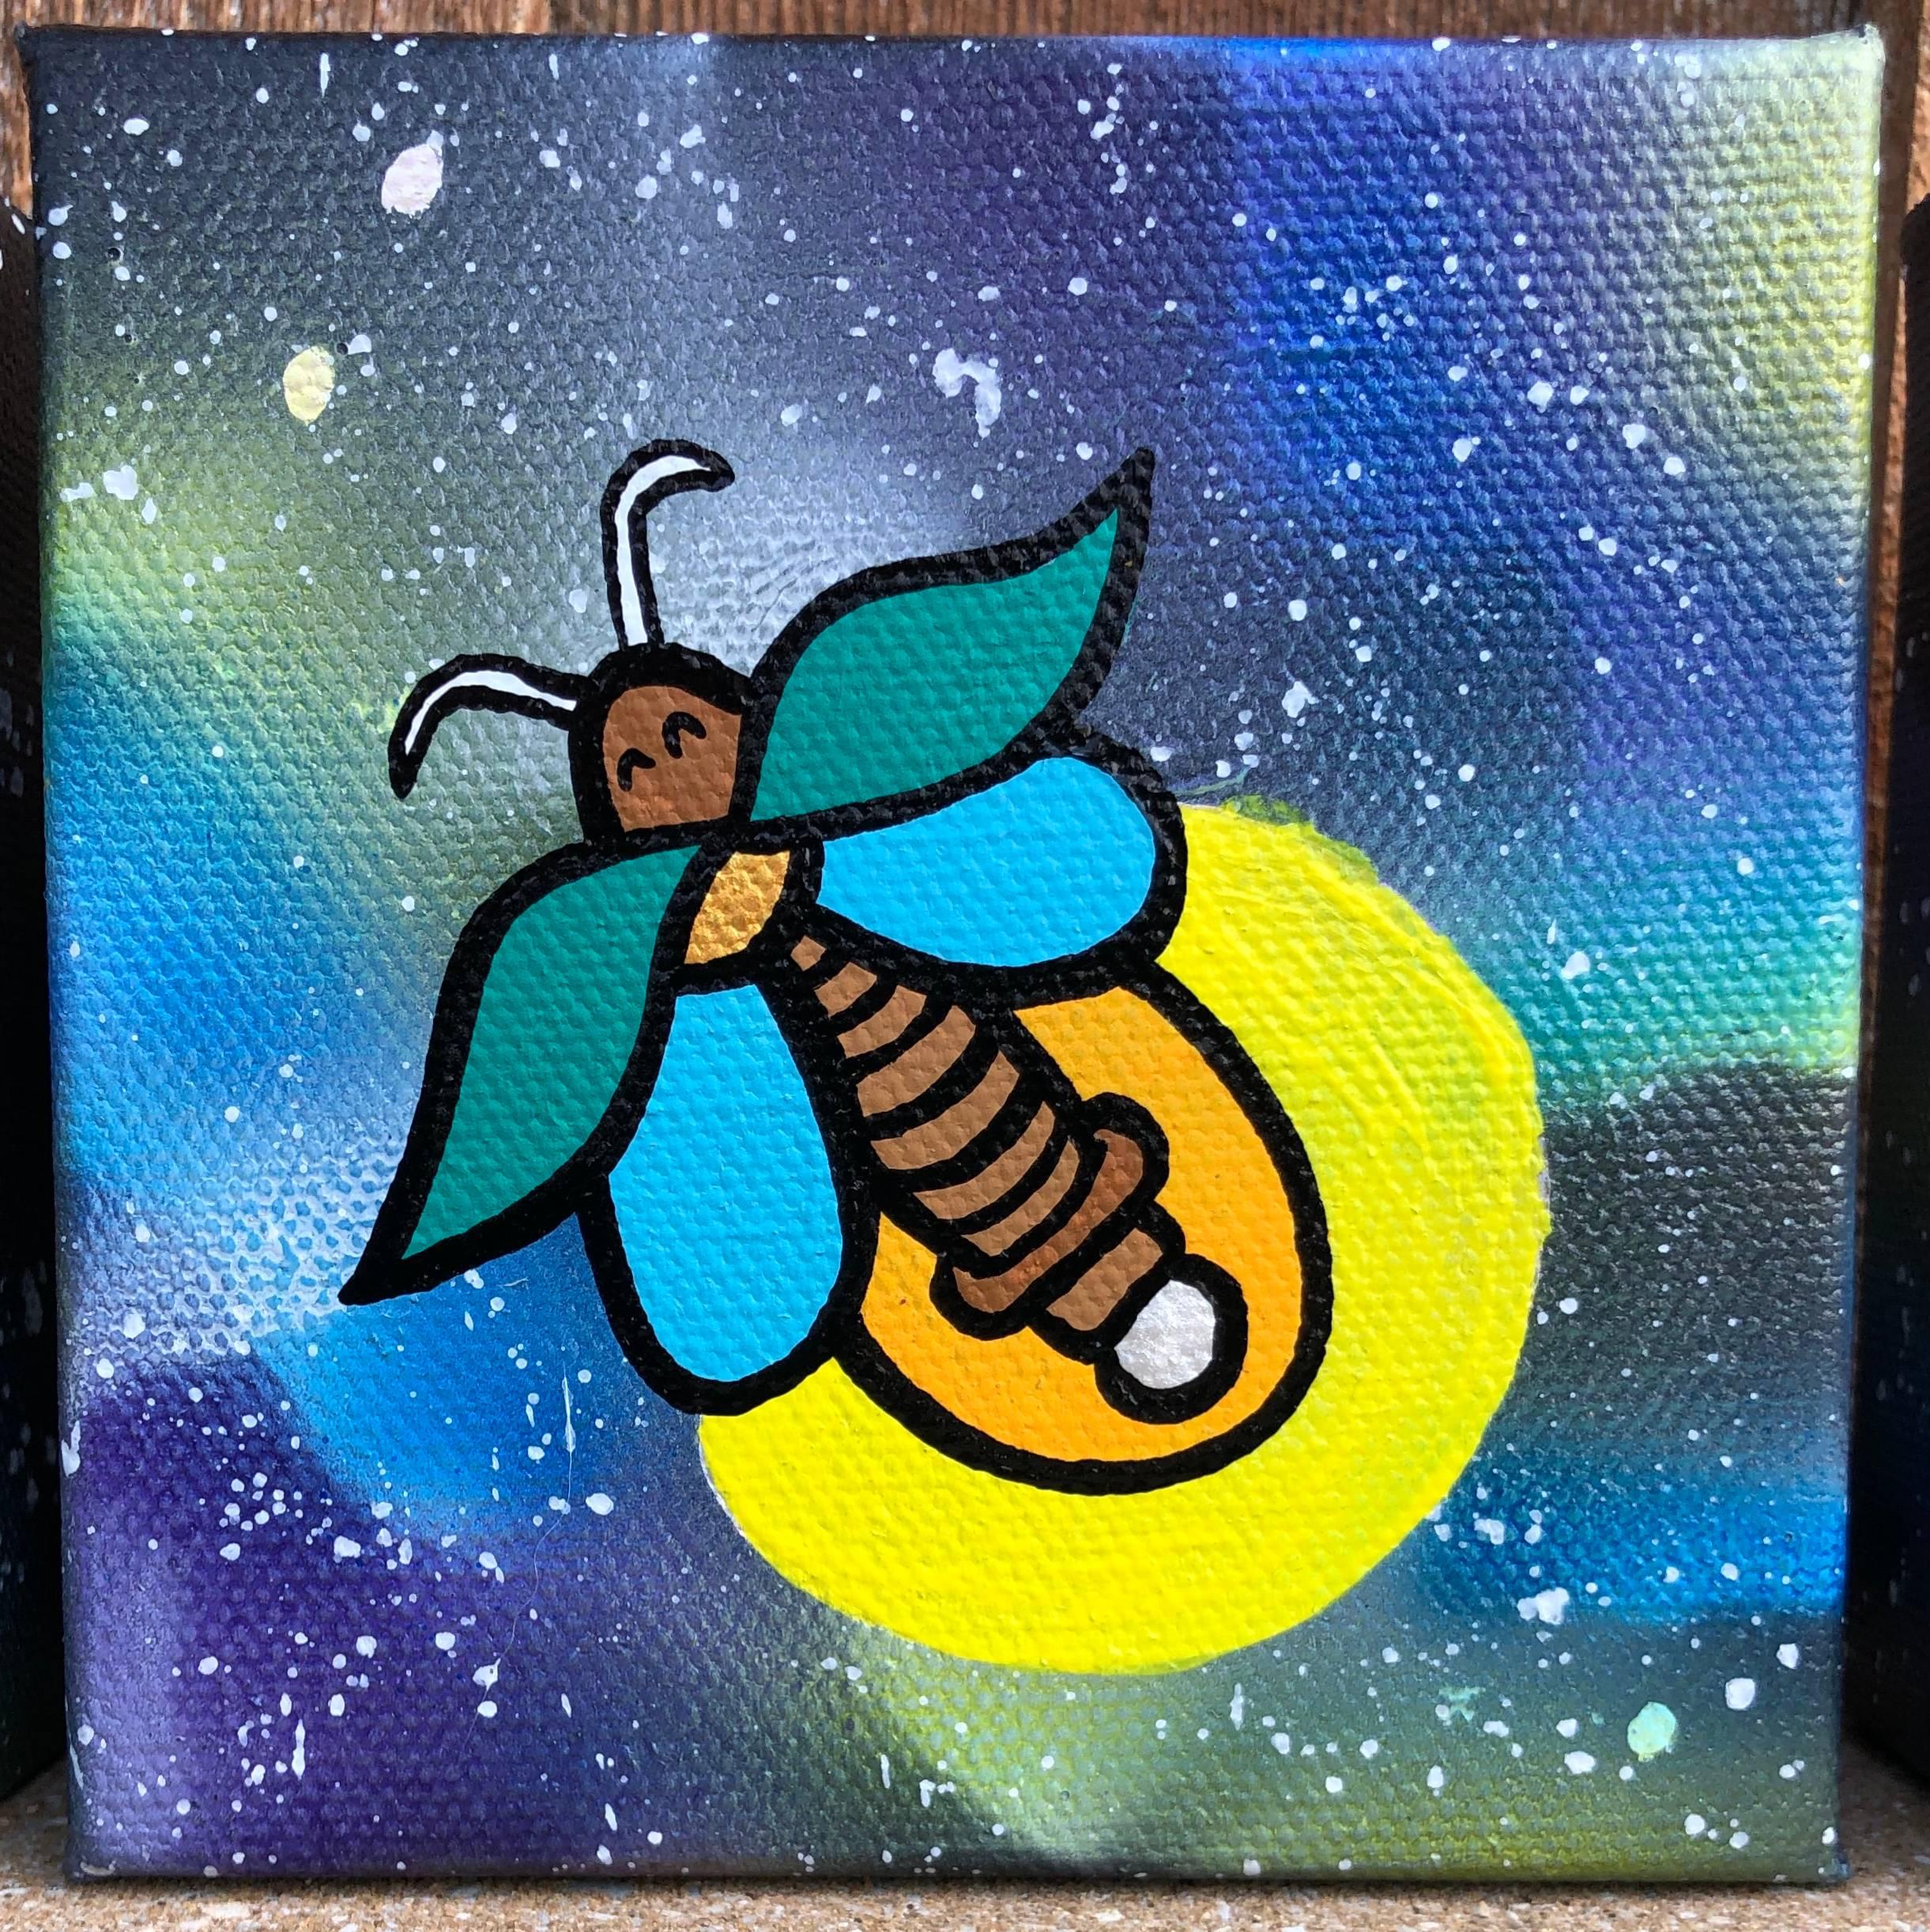 Fireflies in Space!